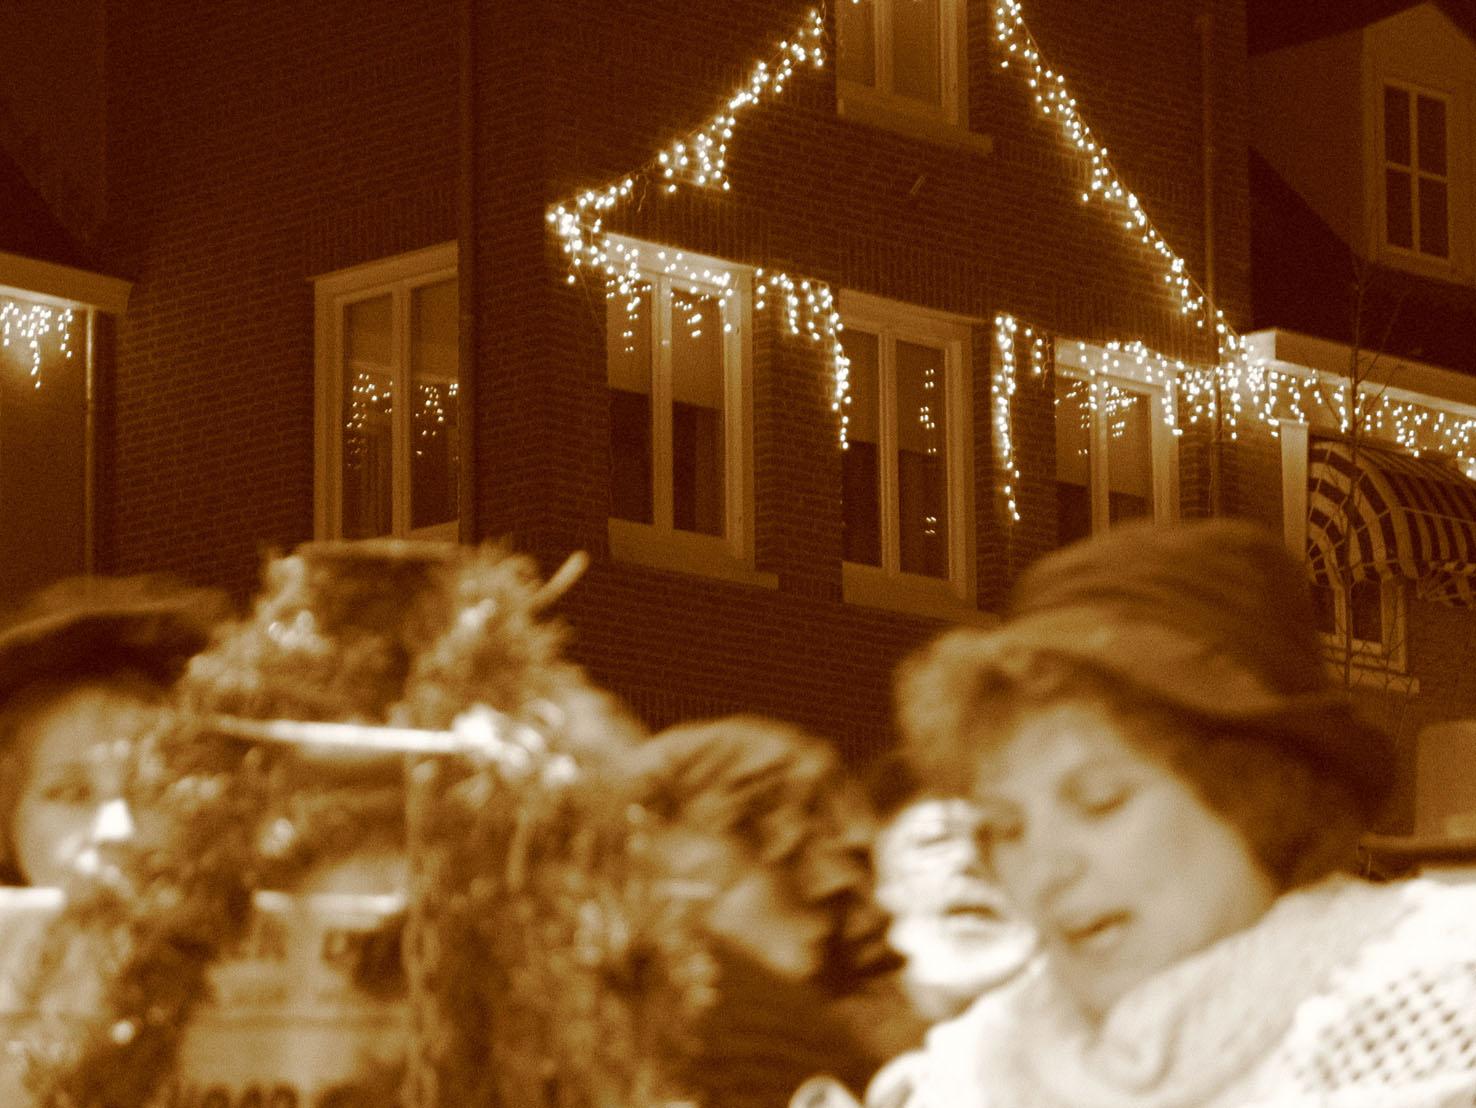 169 - Kerstmarkt Helmond 2003.jpg